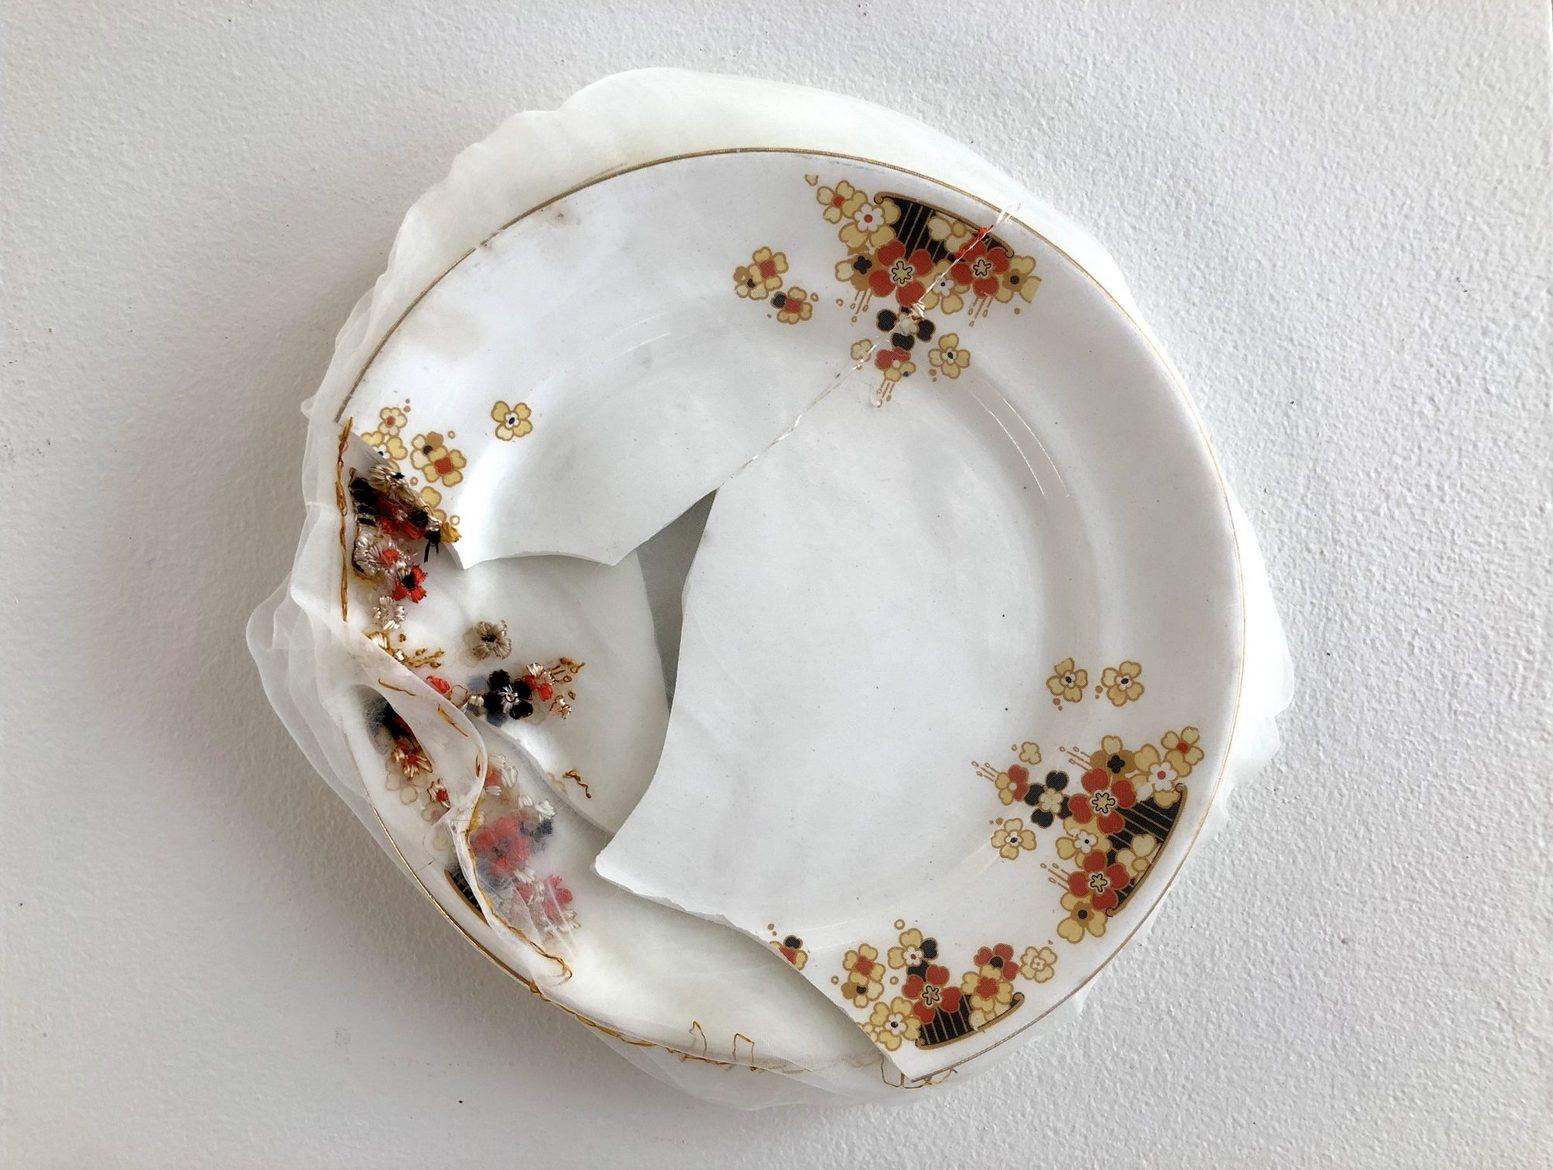 'Renovated orange plate', 2015, Italian synthetic cloth, ceramic, Japanese silk thread, 24 cm diameter